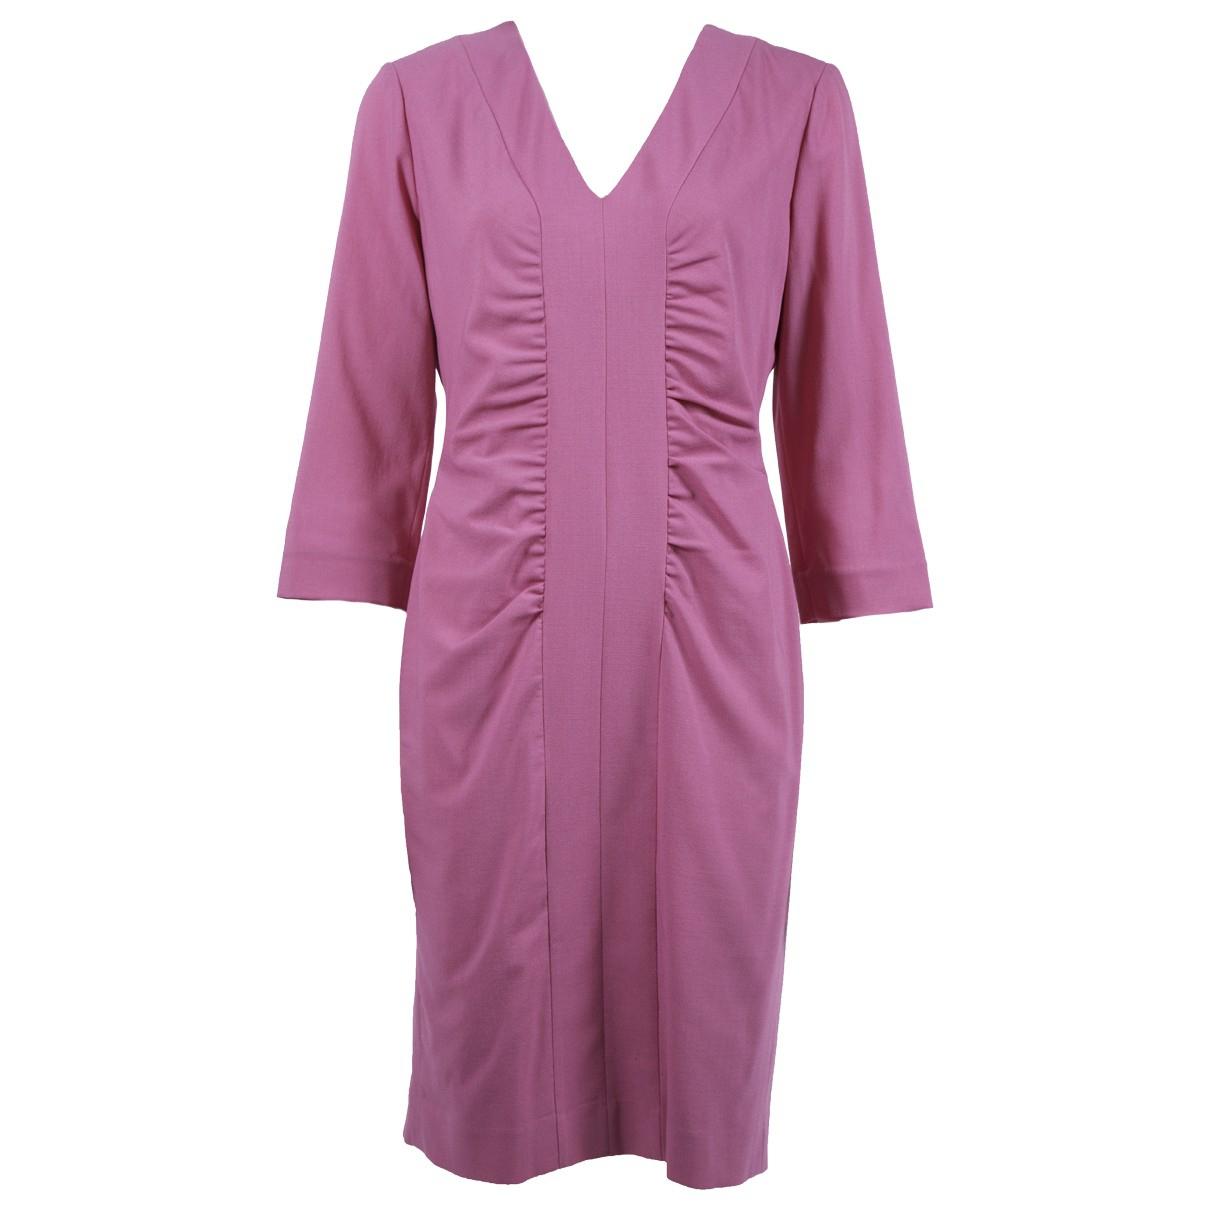 Narciso Rodriguez \N Kleid in  Rosa Wolle